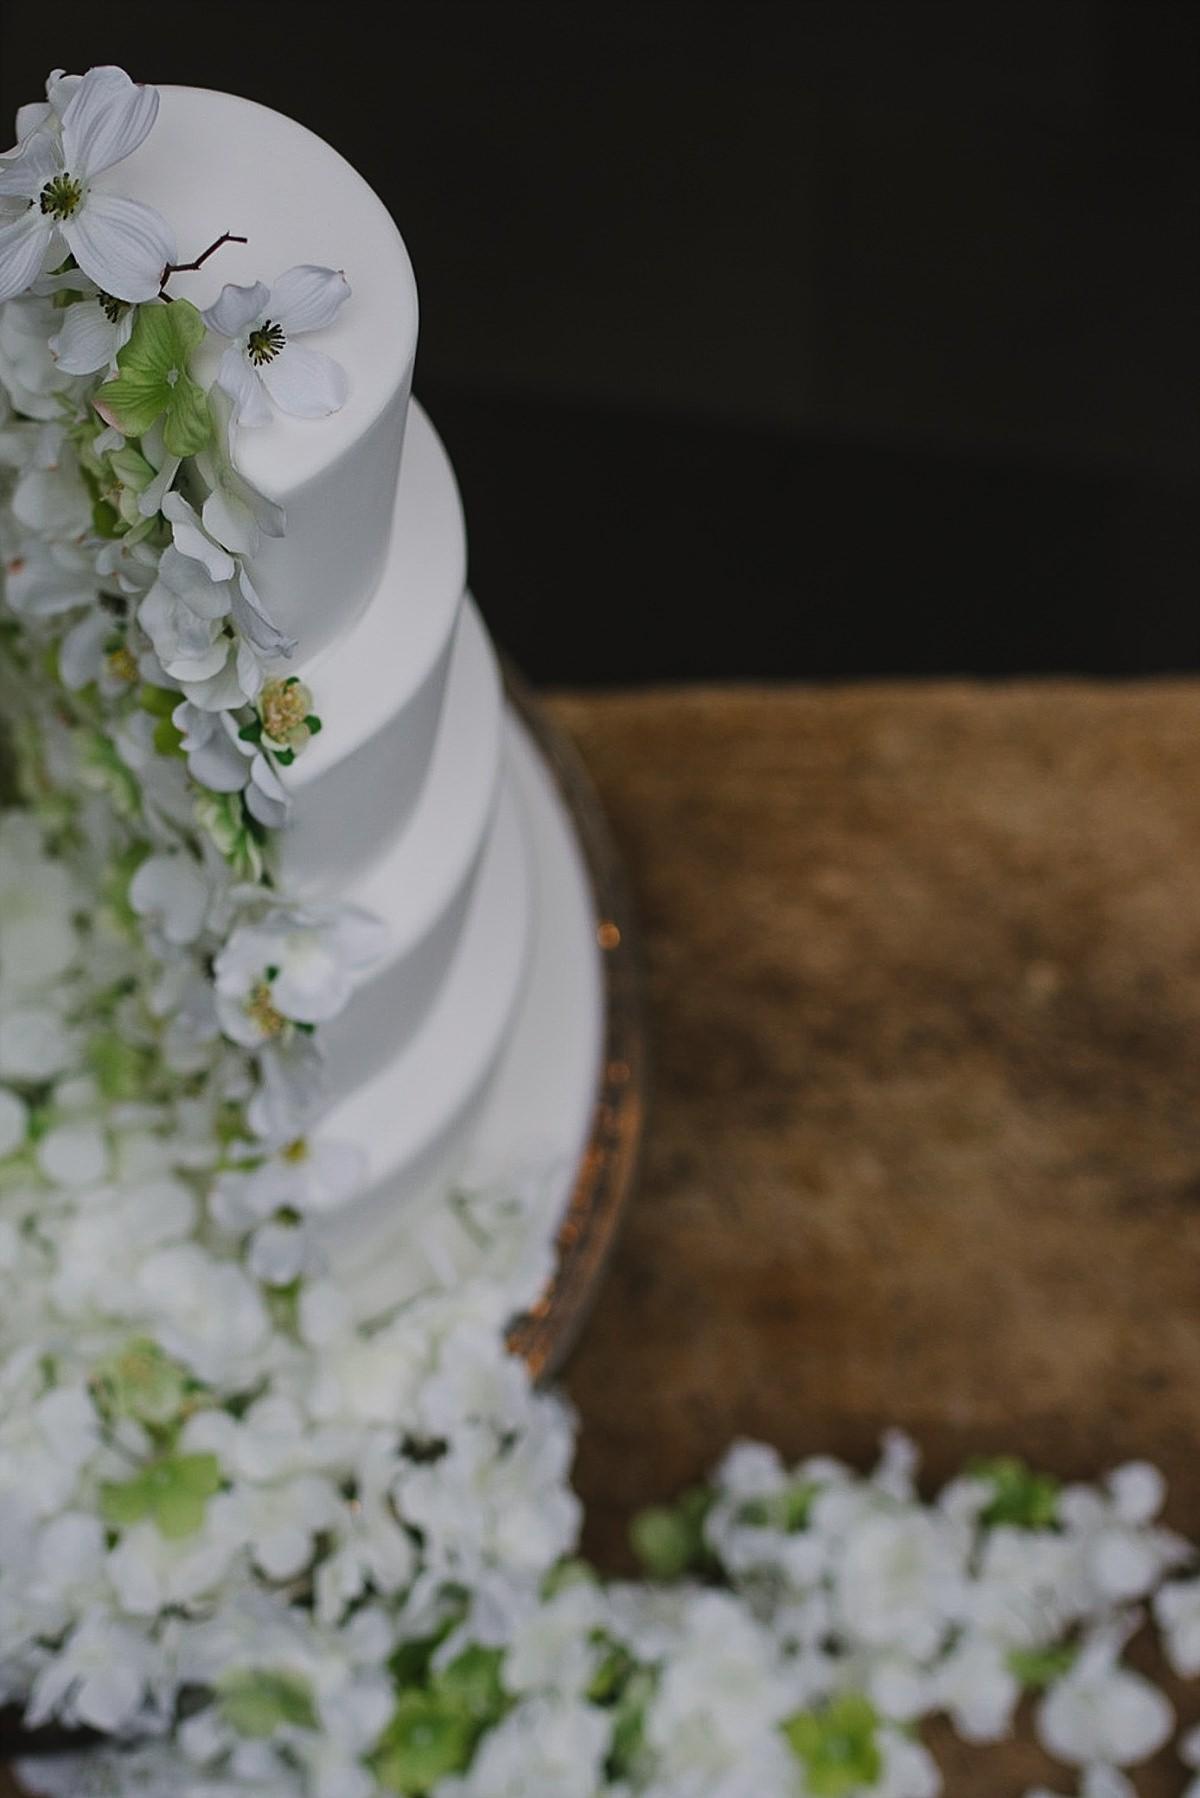 Hampton Manor wedding supplier Ben the Cake Man